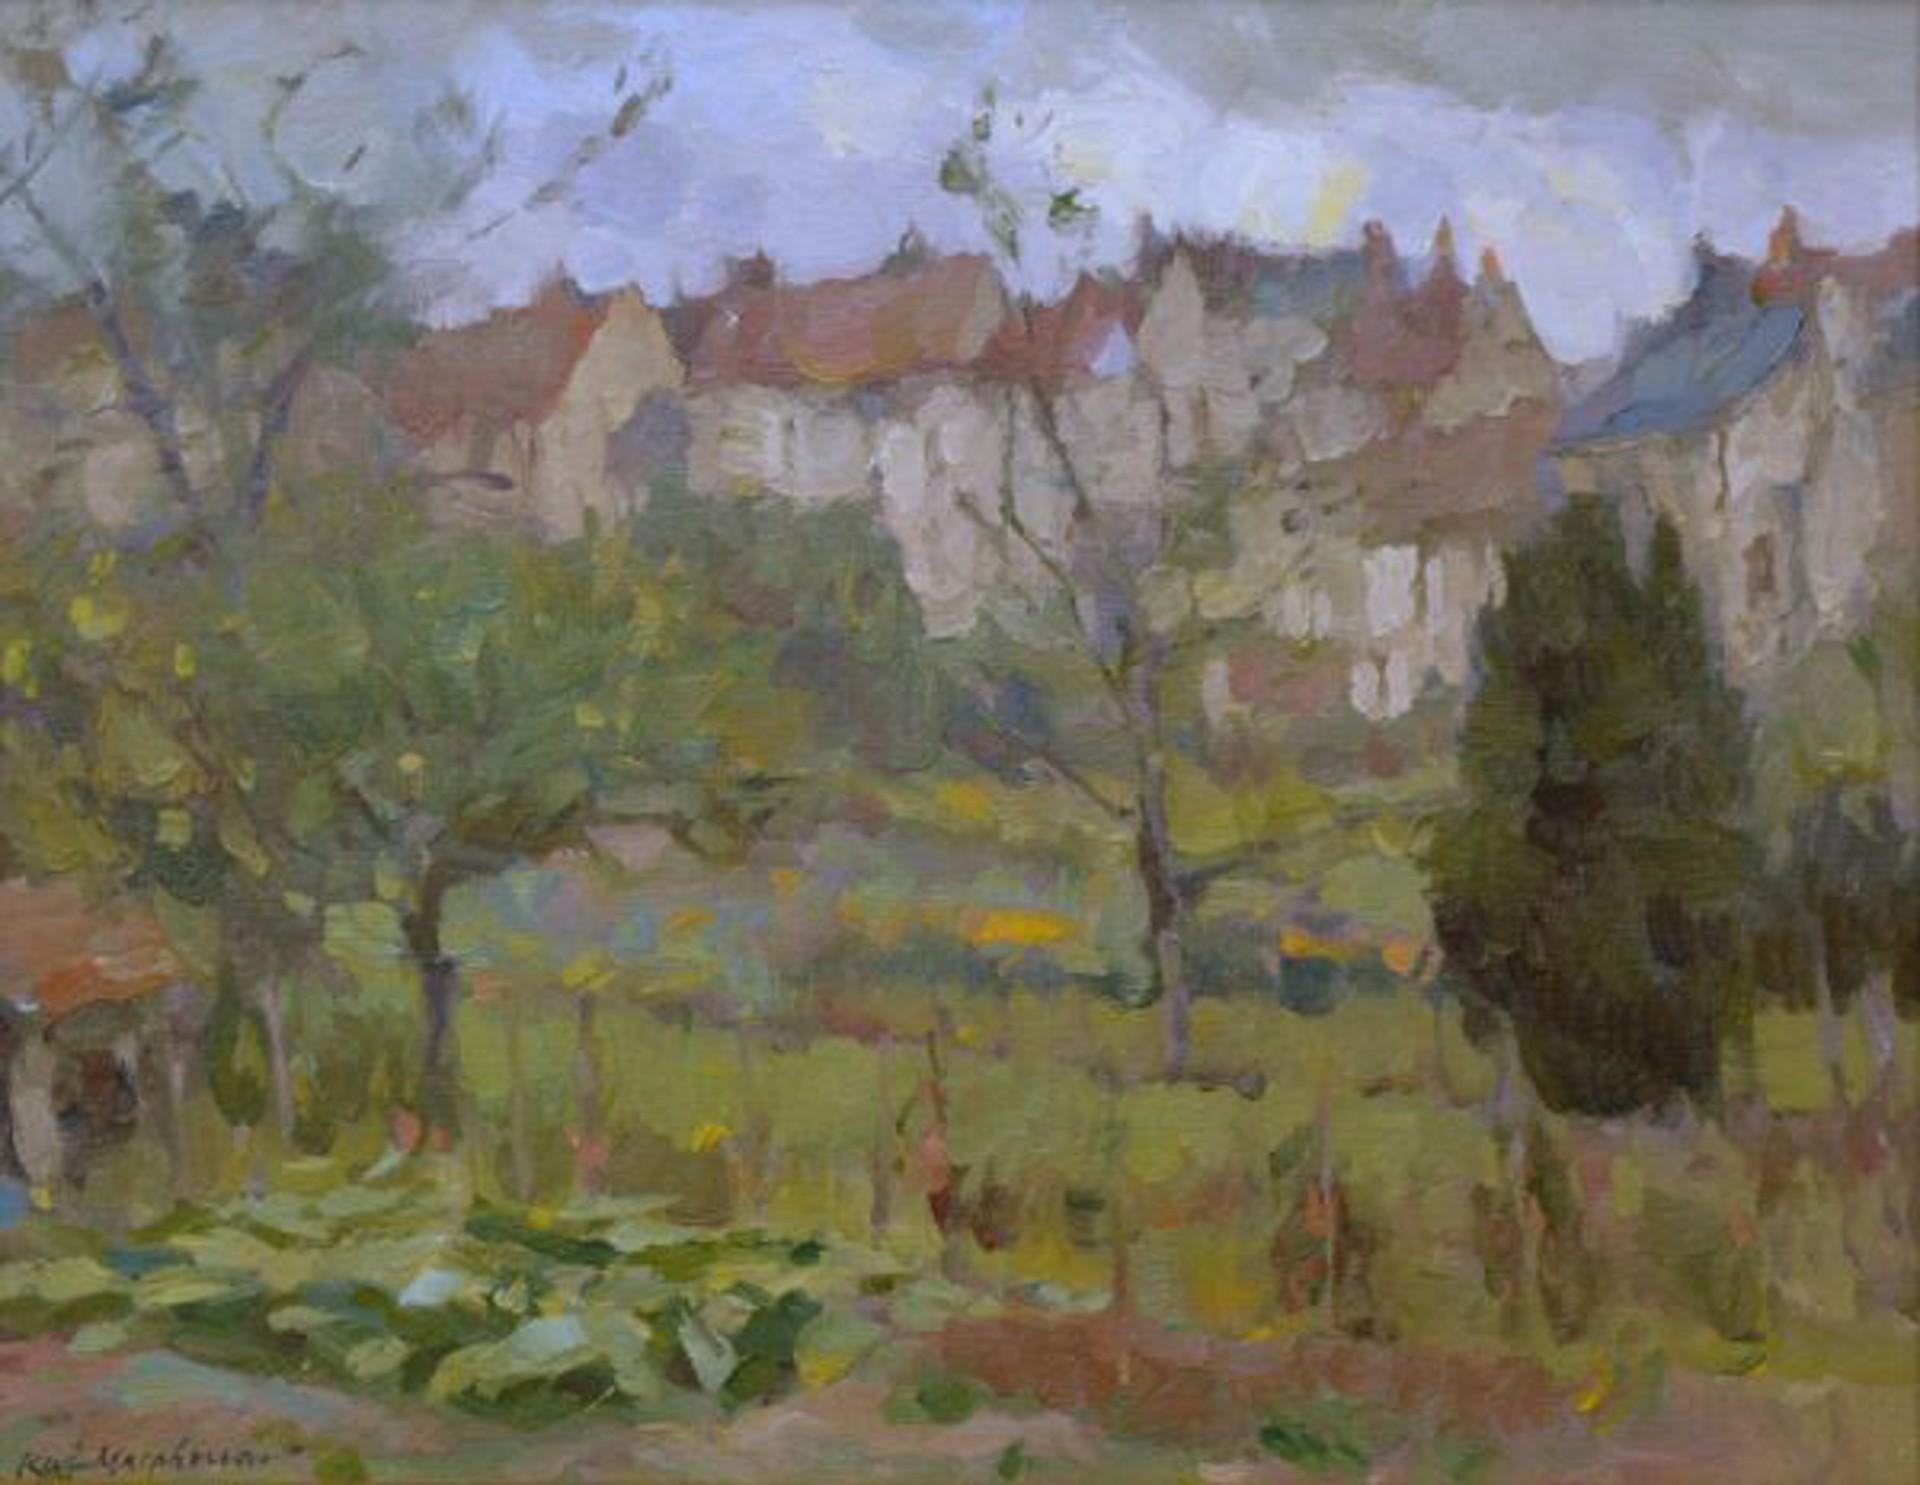 Community Garden (Montresor, France) by Kevin Macpherson